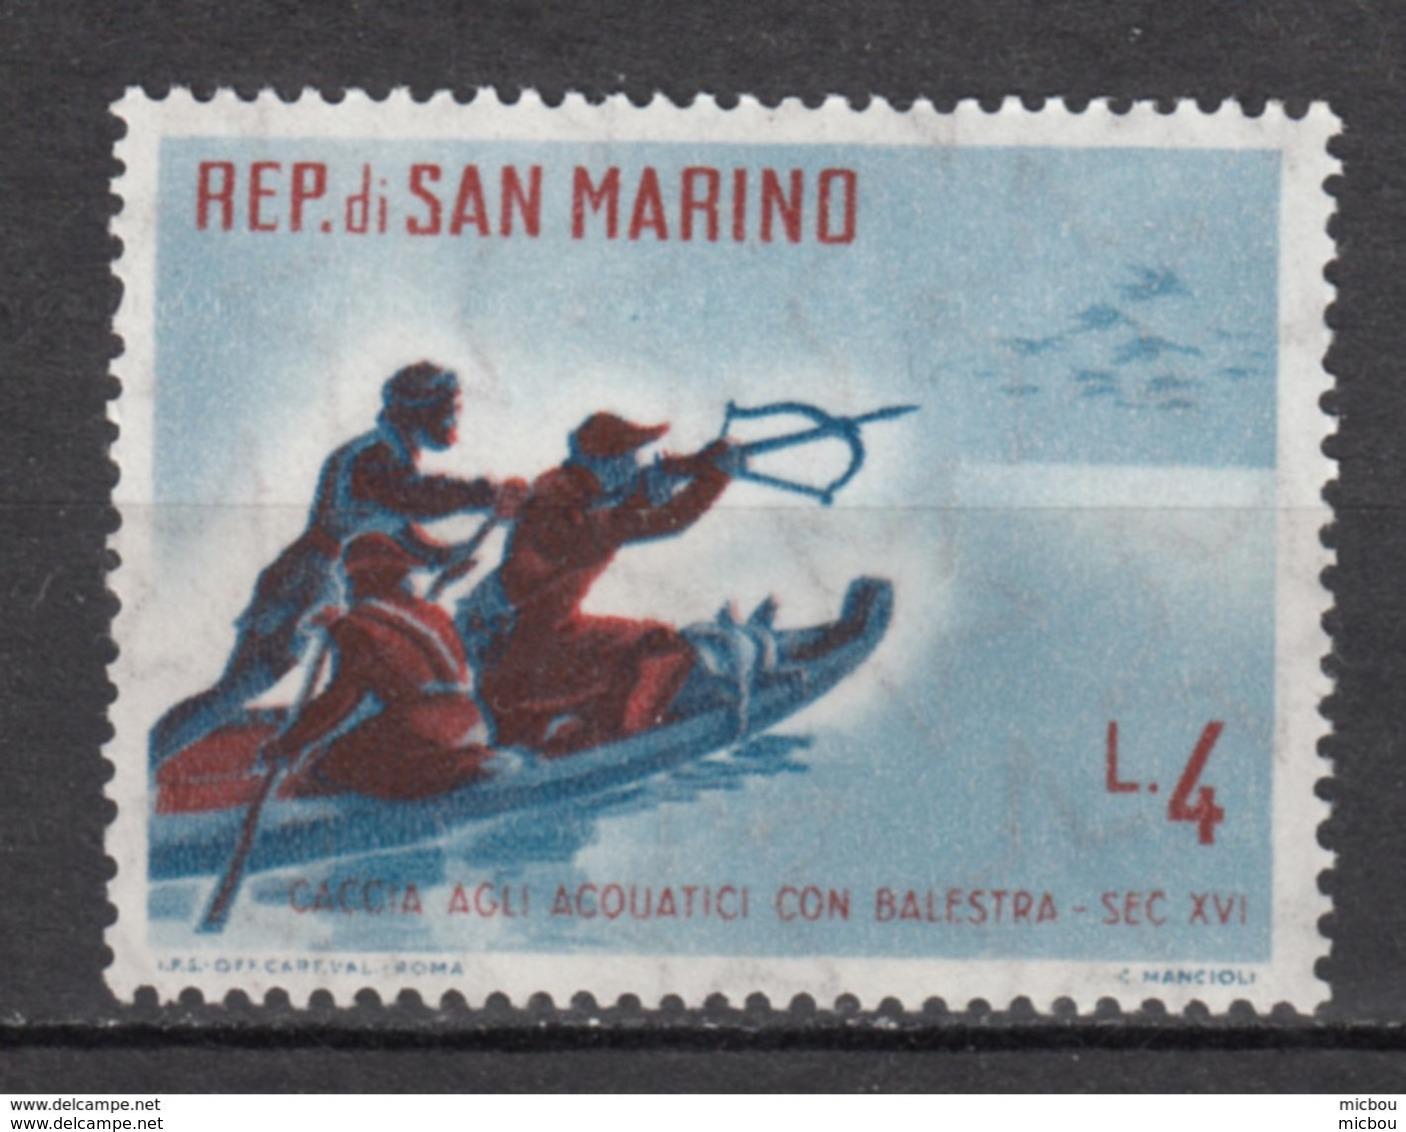 Saint-Marin, San Marino, MH, Tir à L'arc, Archery, Canard, Duck, Arbalette, Bateau, Boat - Tir à L'Arc